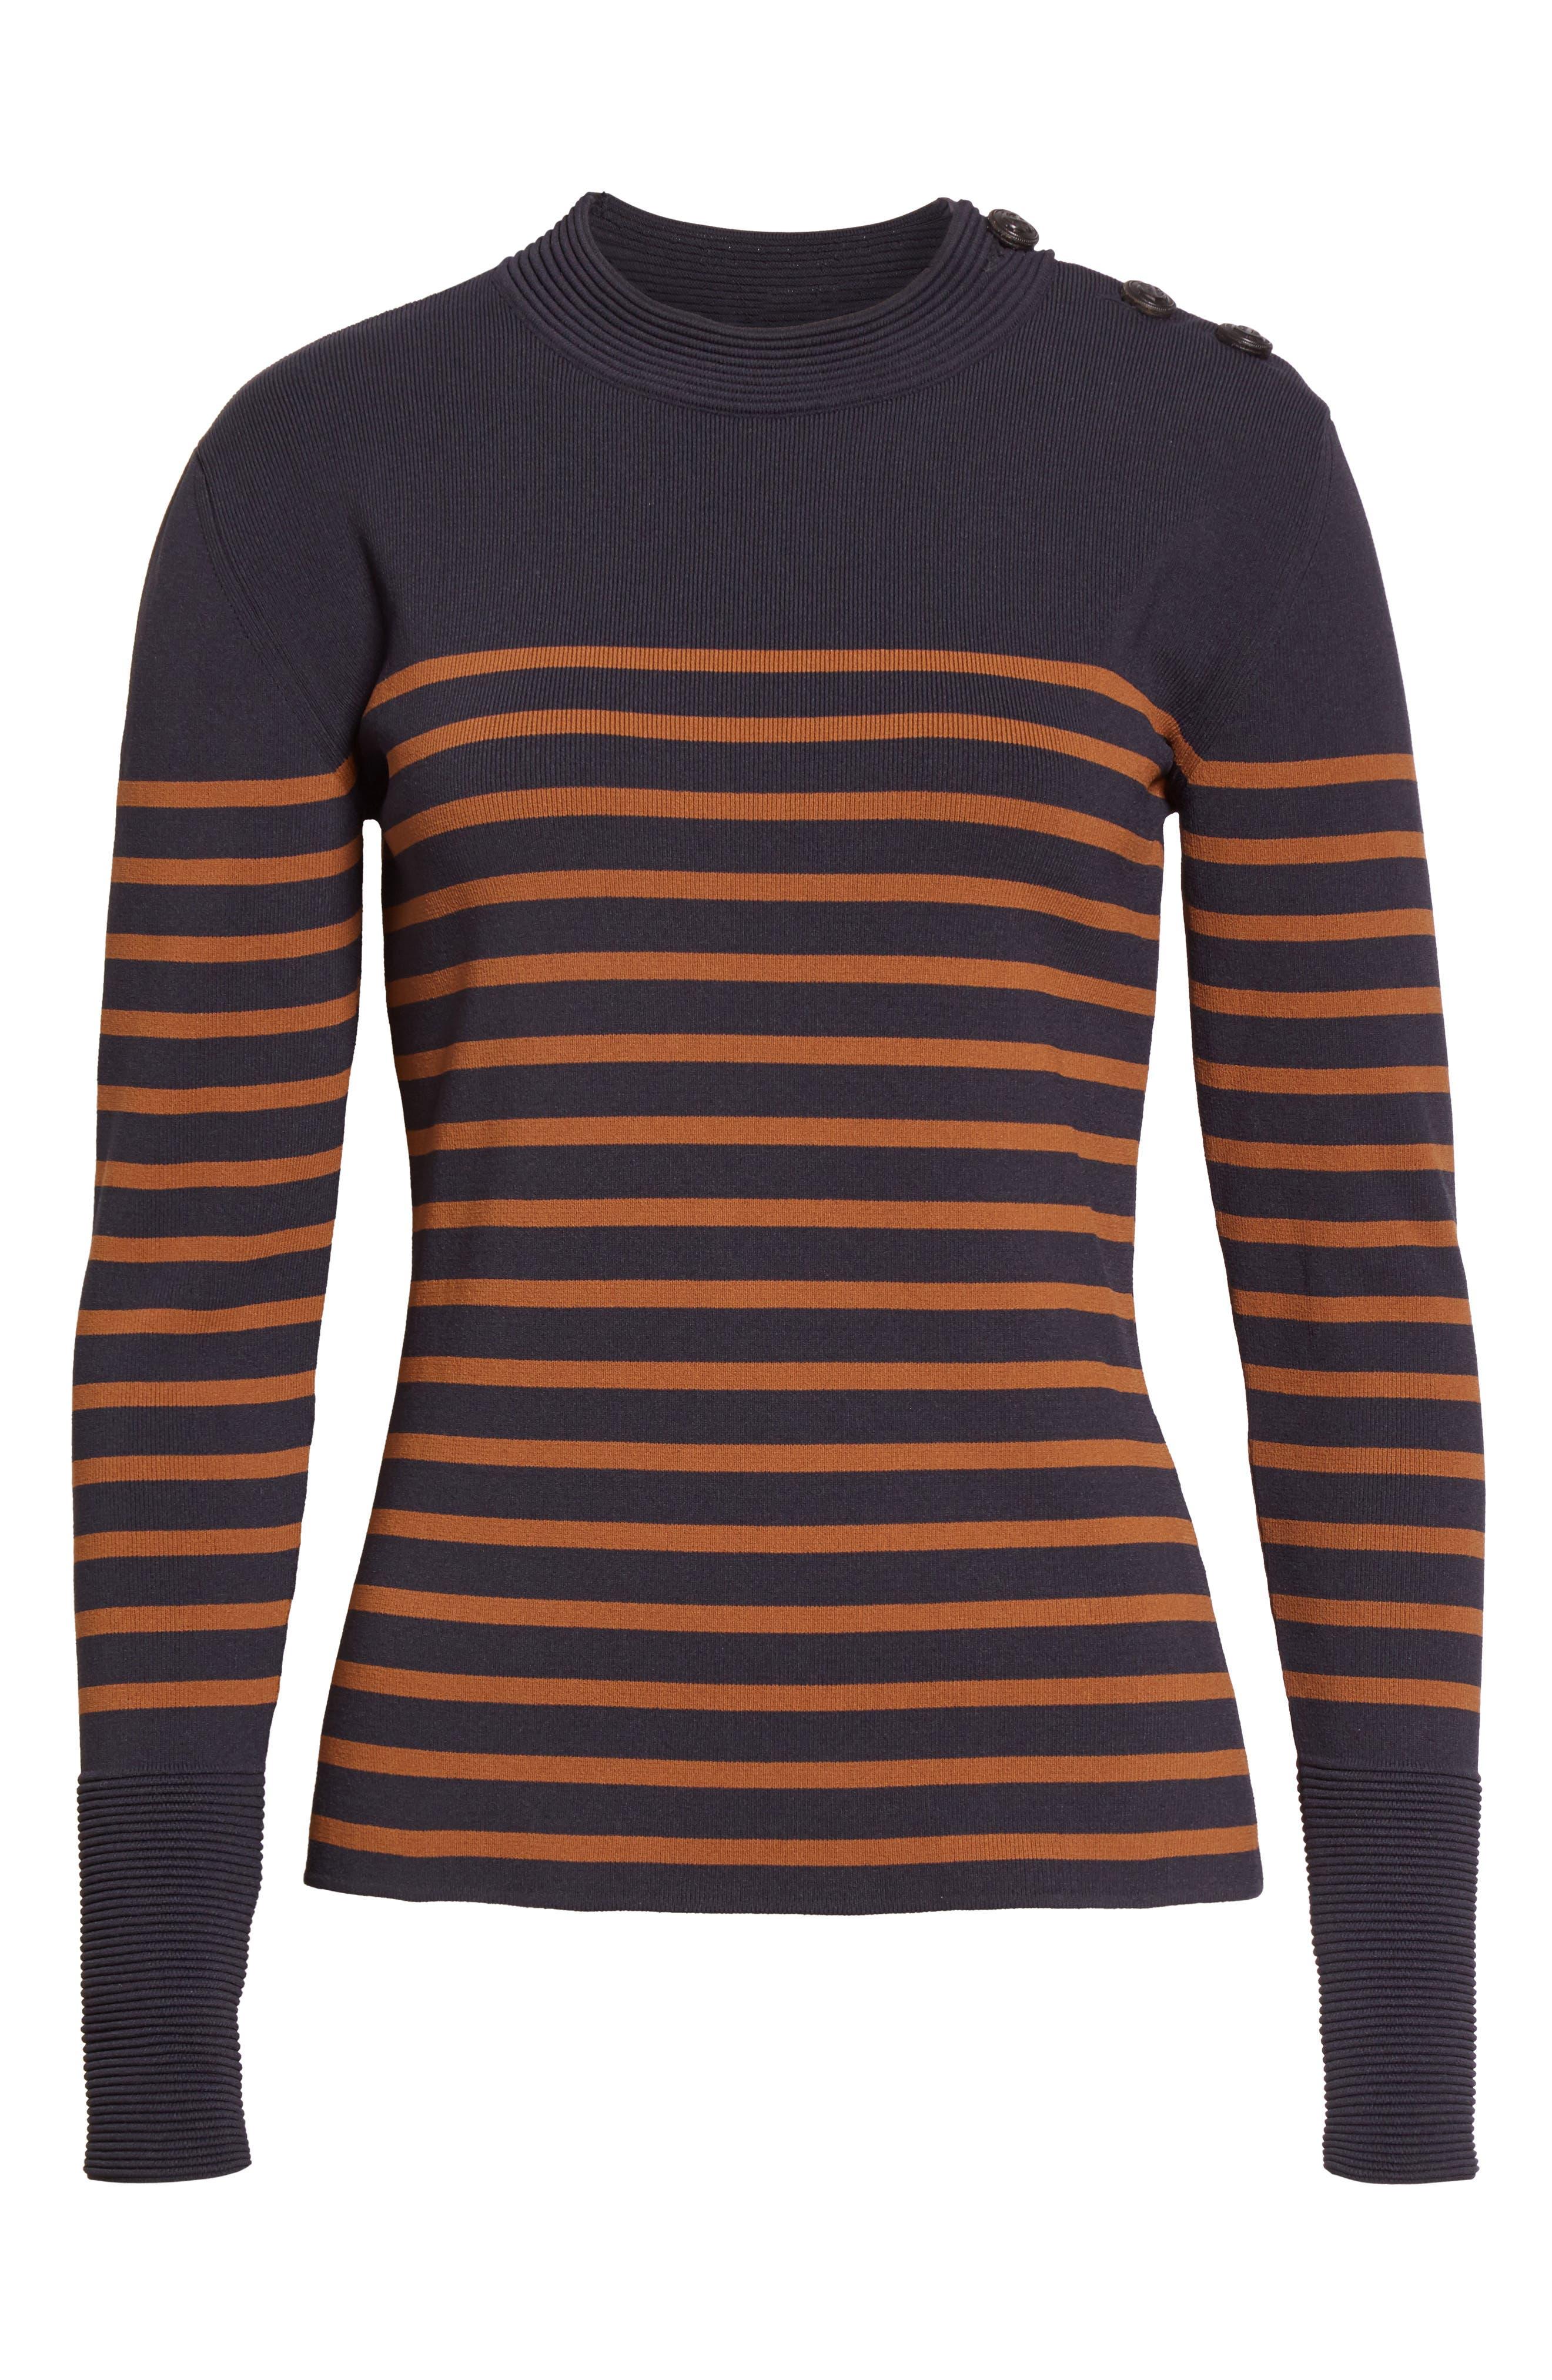 Selicia Stripe Sweater,                             Alternate thumbnail 4, color,                             Black